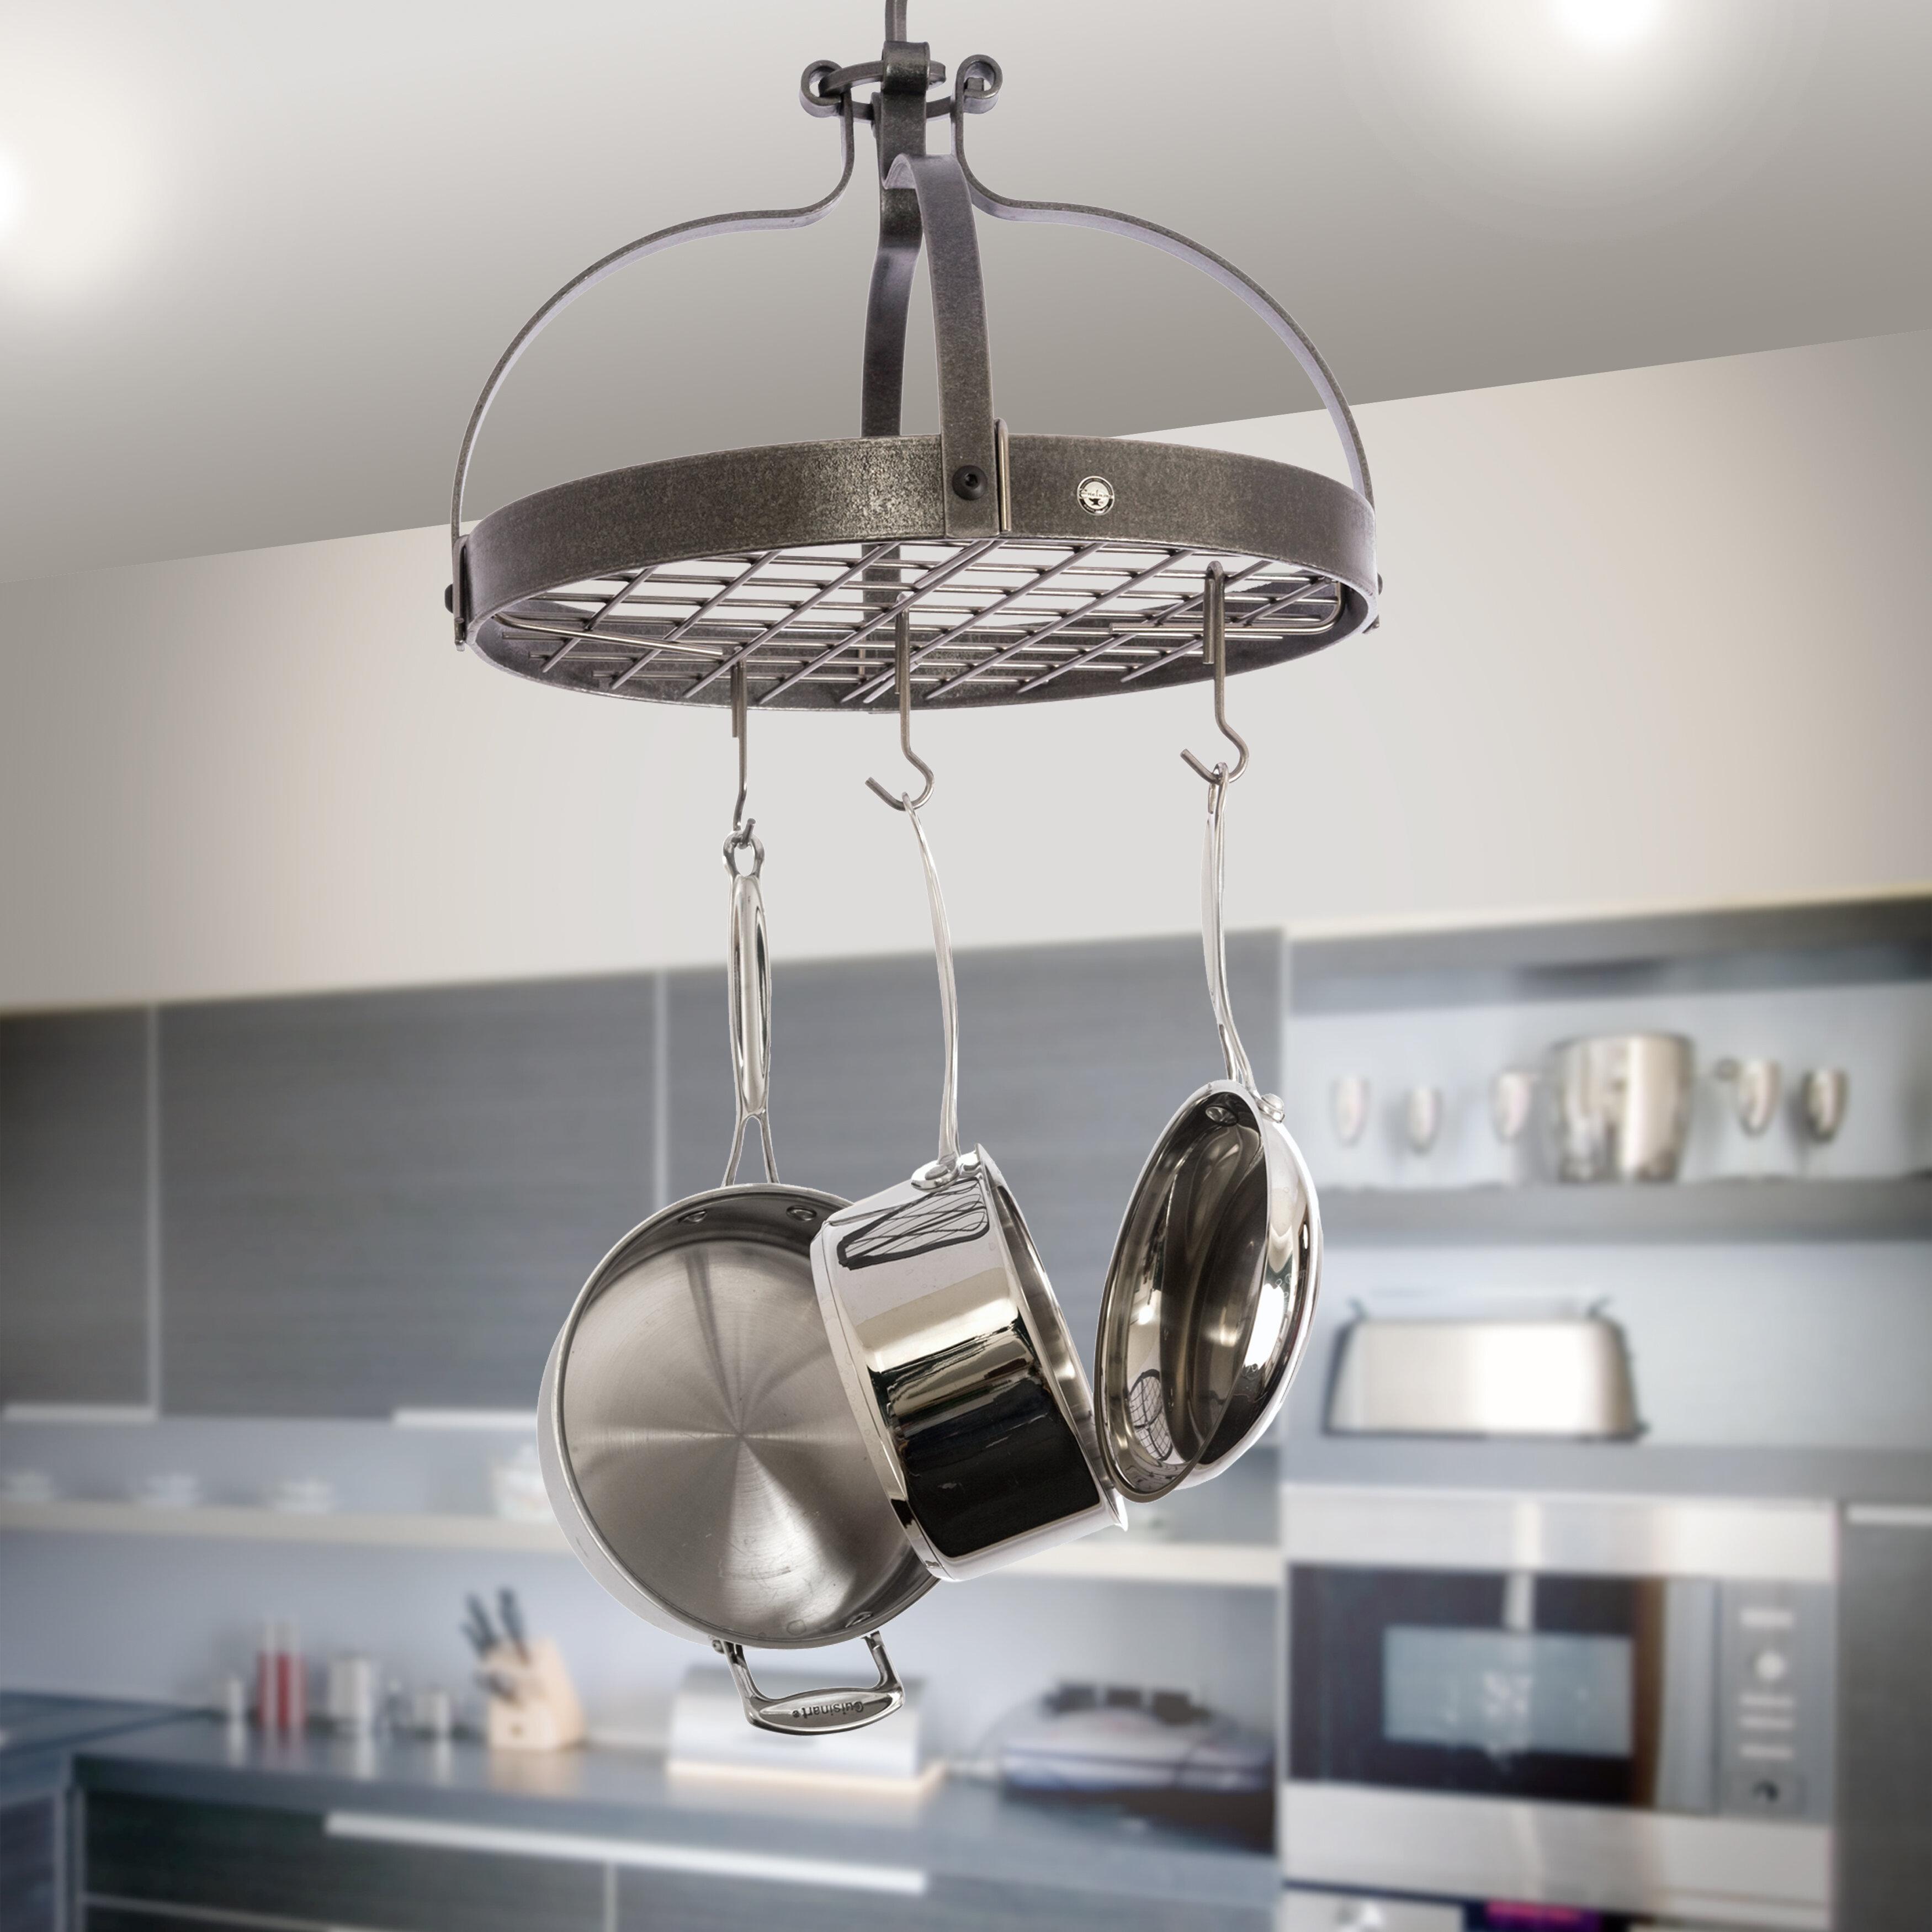 Gourmet Dutch Crown Hanging Pot Rack